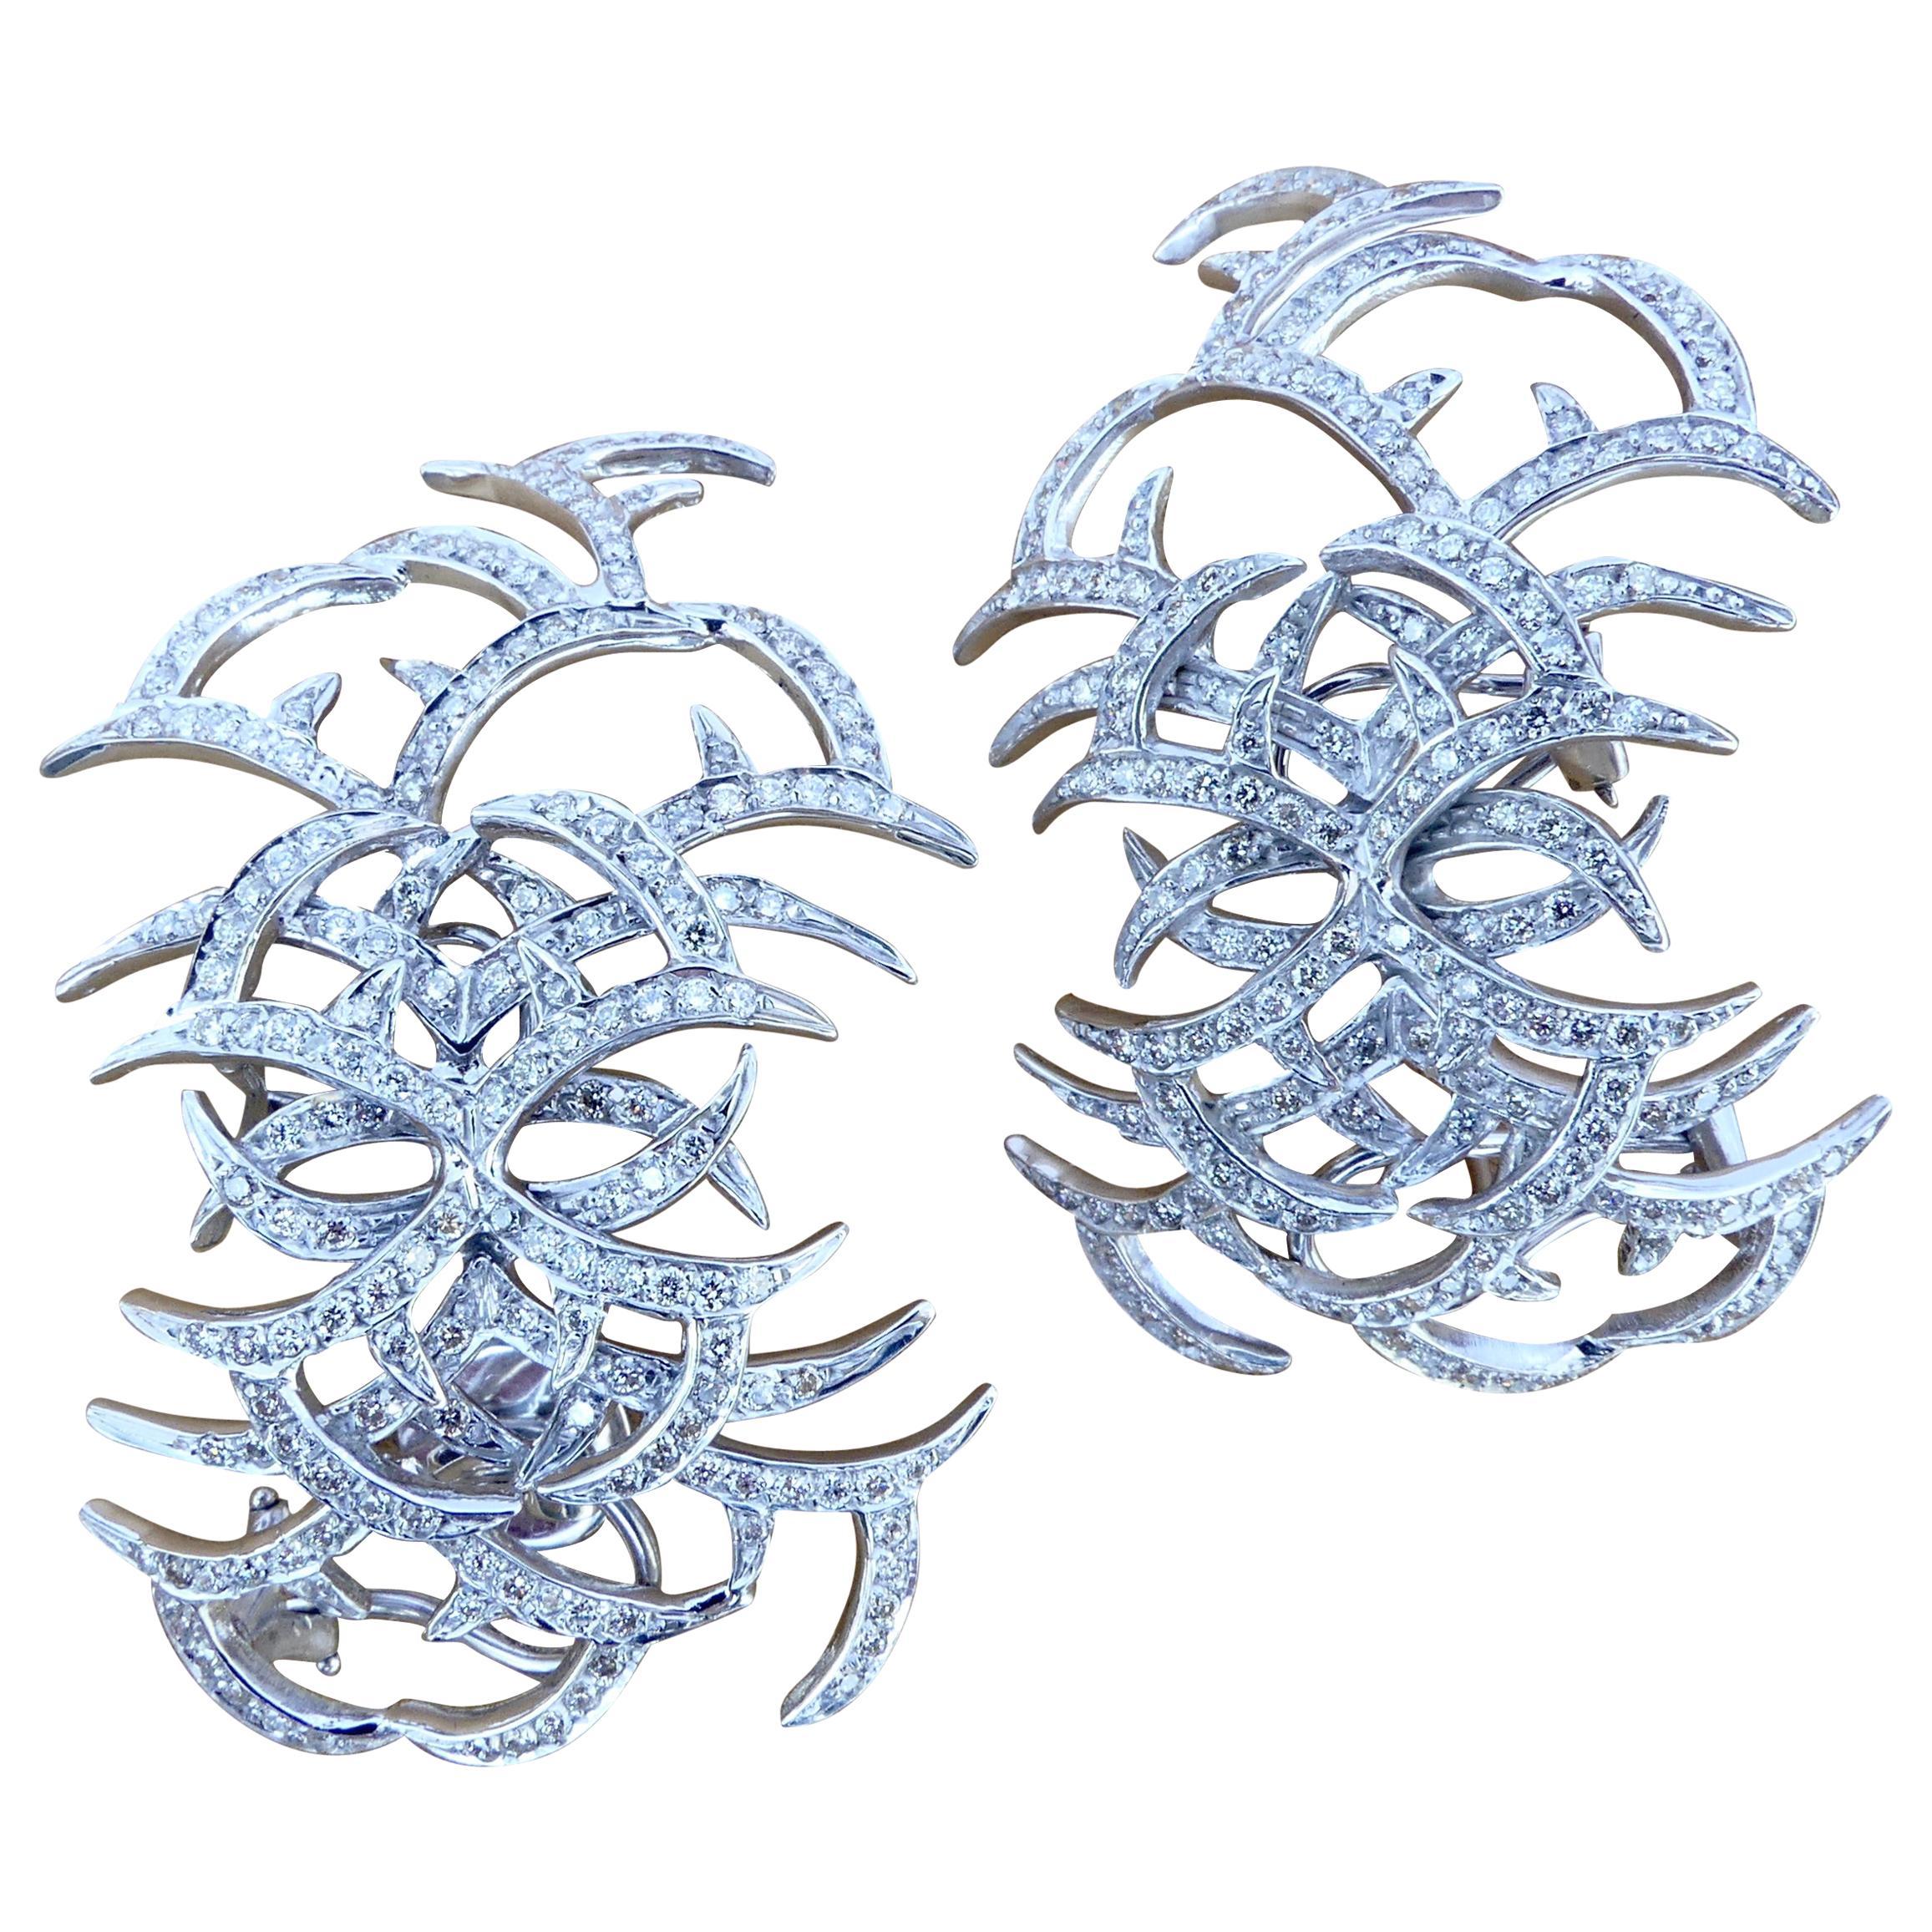 Ana Khouri Arachnid Diamond Earrings, 2013